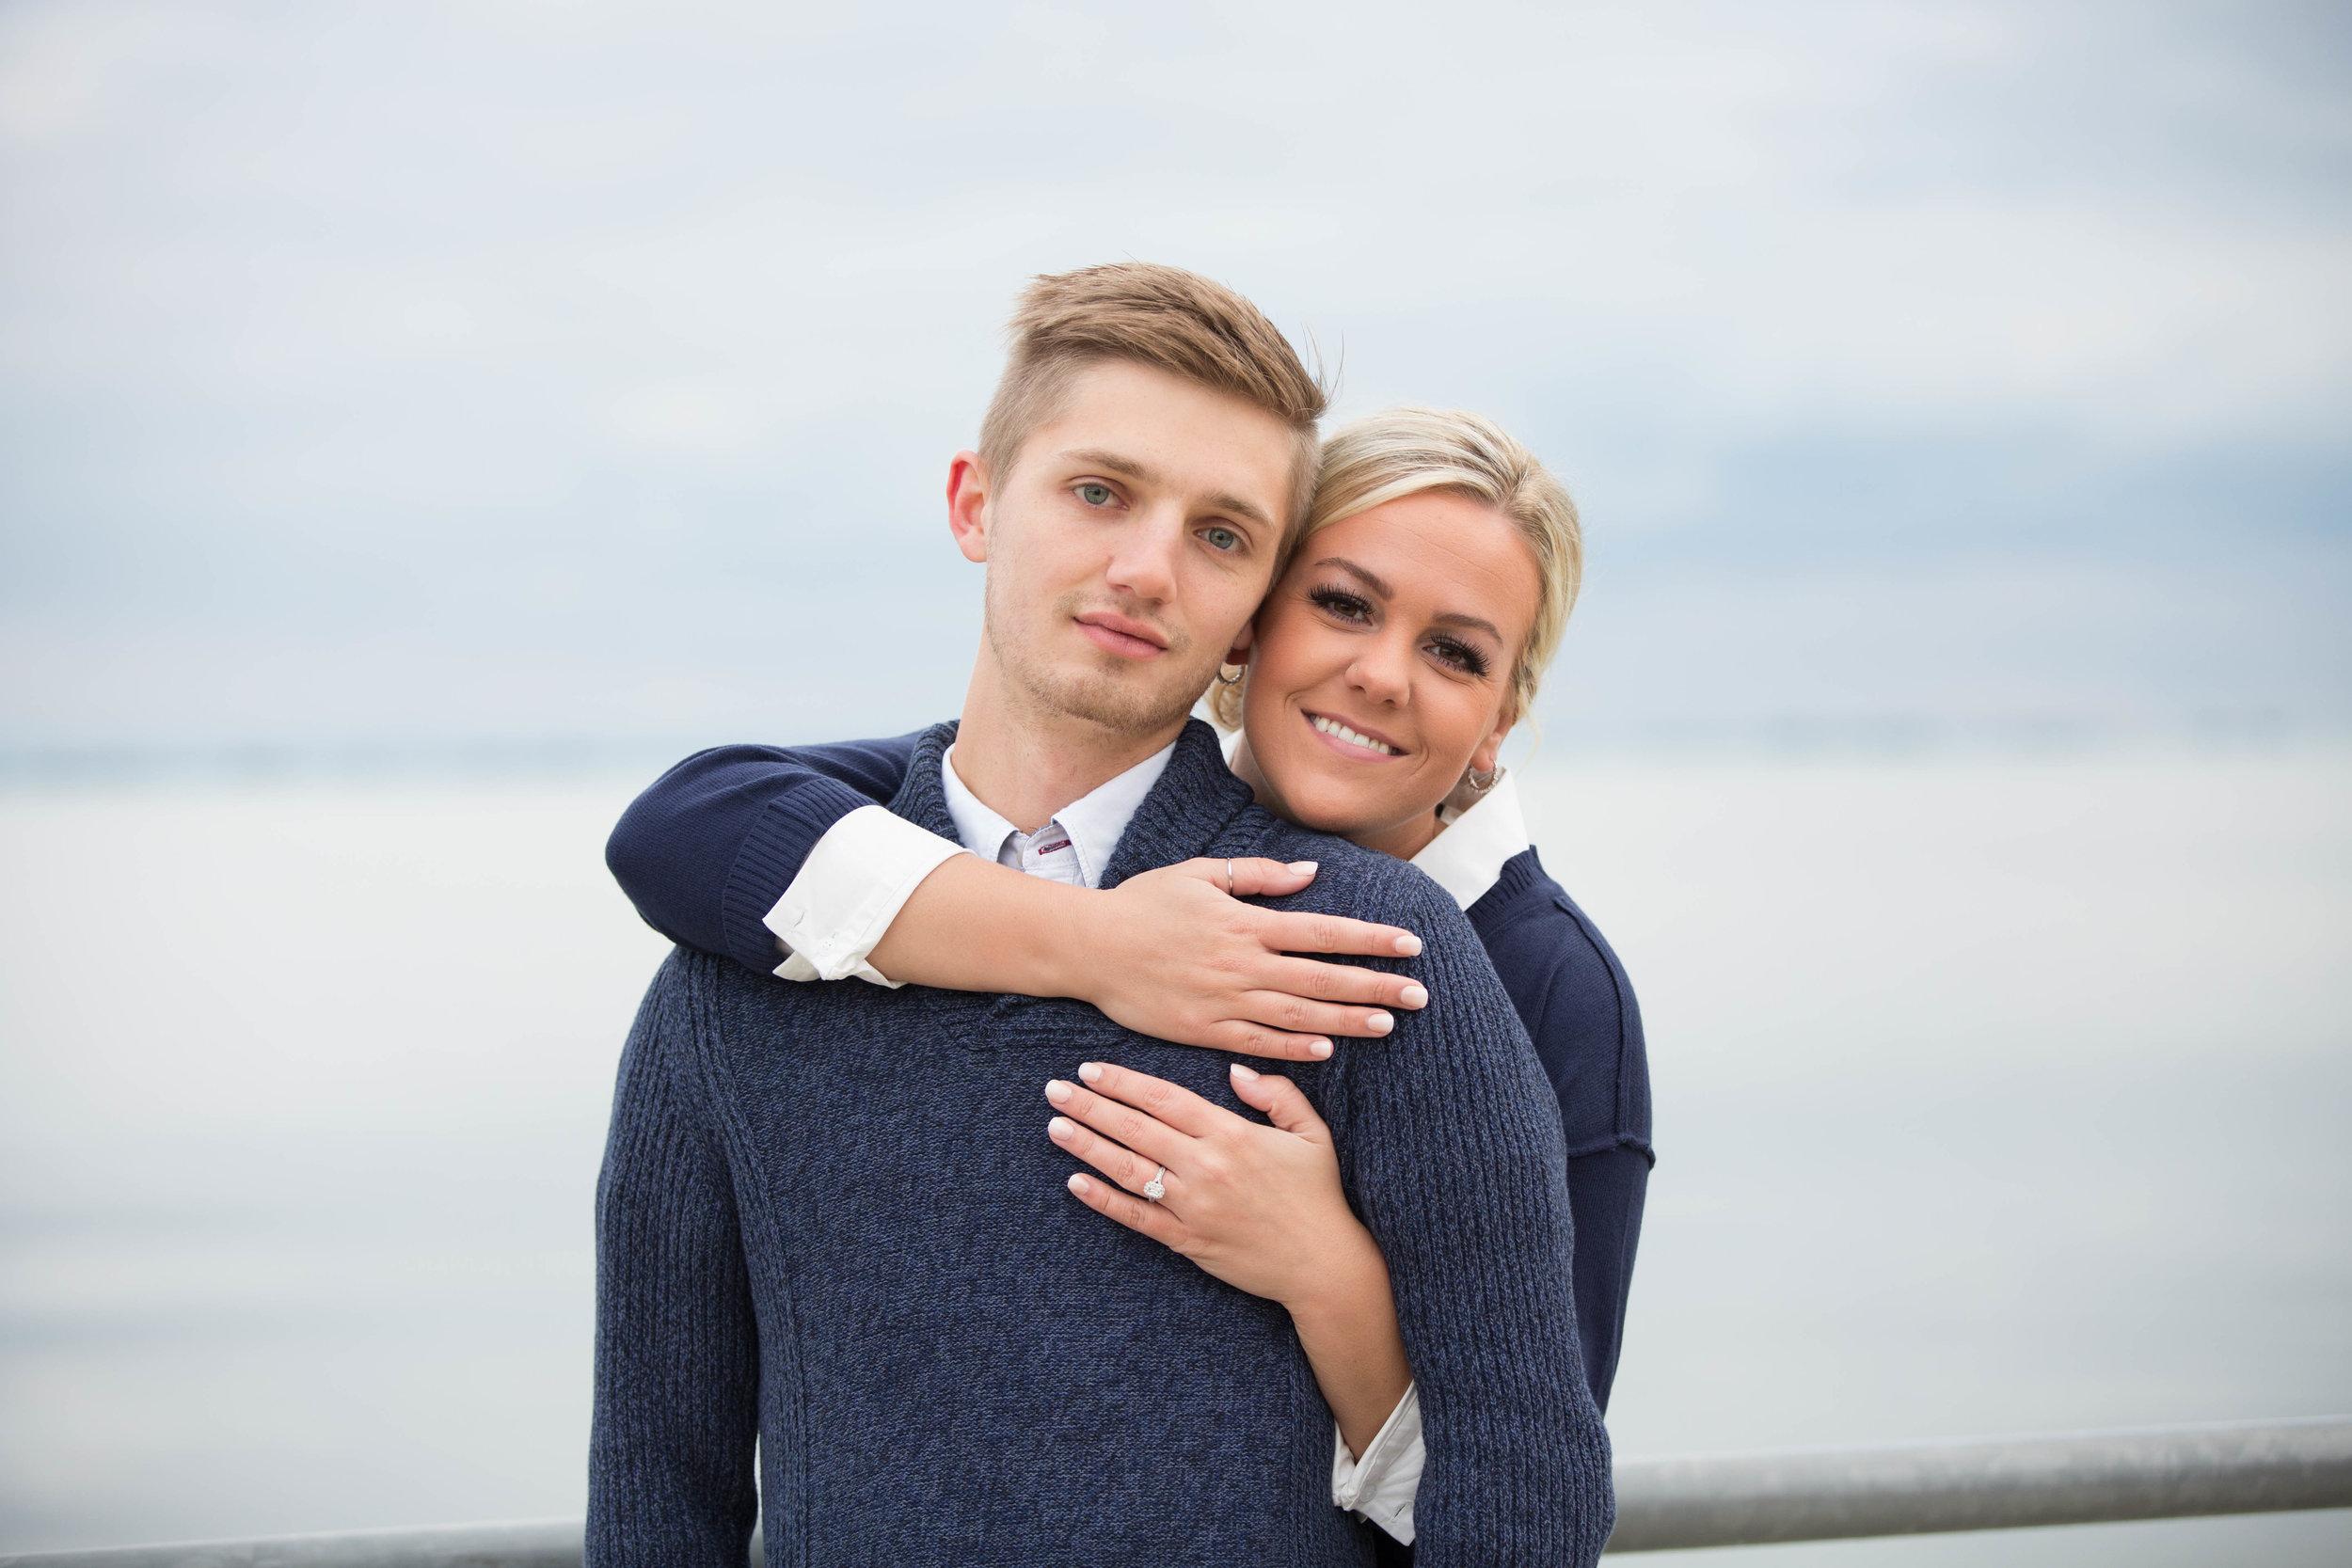 metro-detroit-wedding-photographer-enagement-Villella-010.jpg